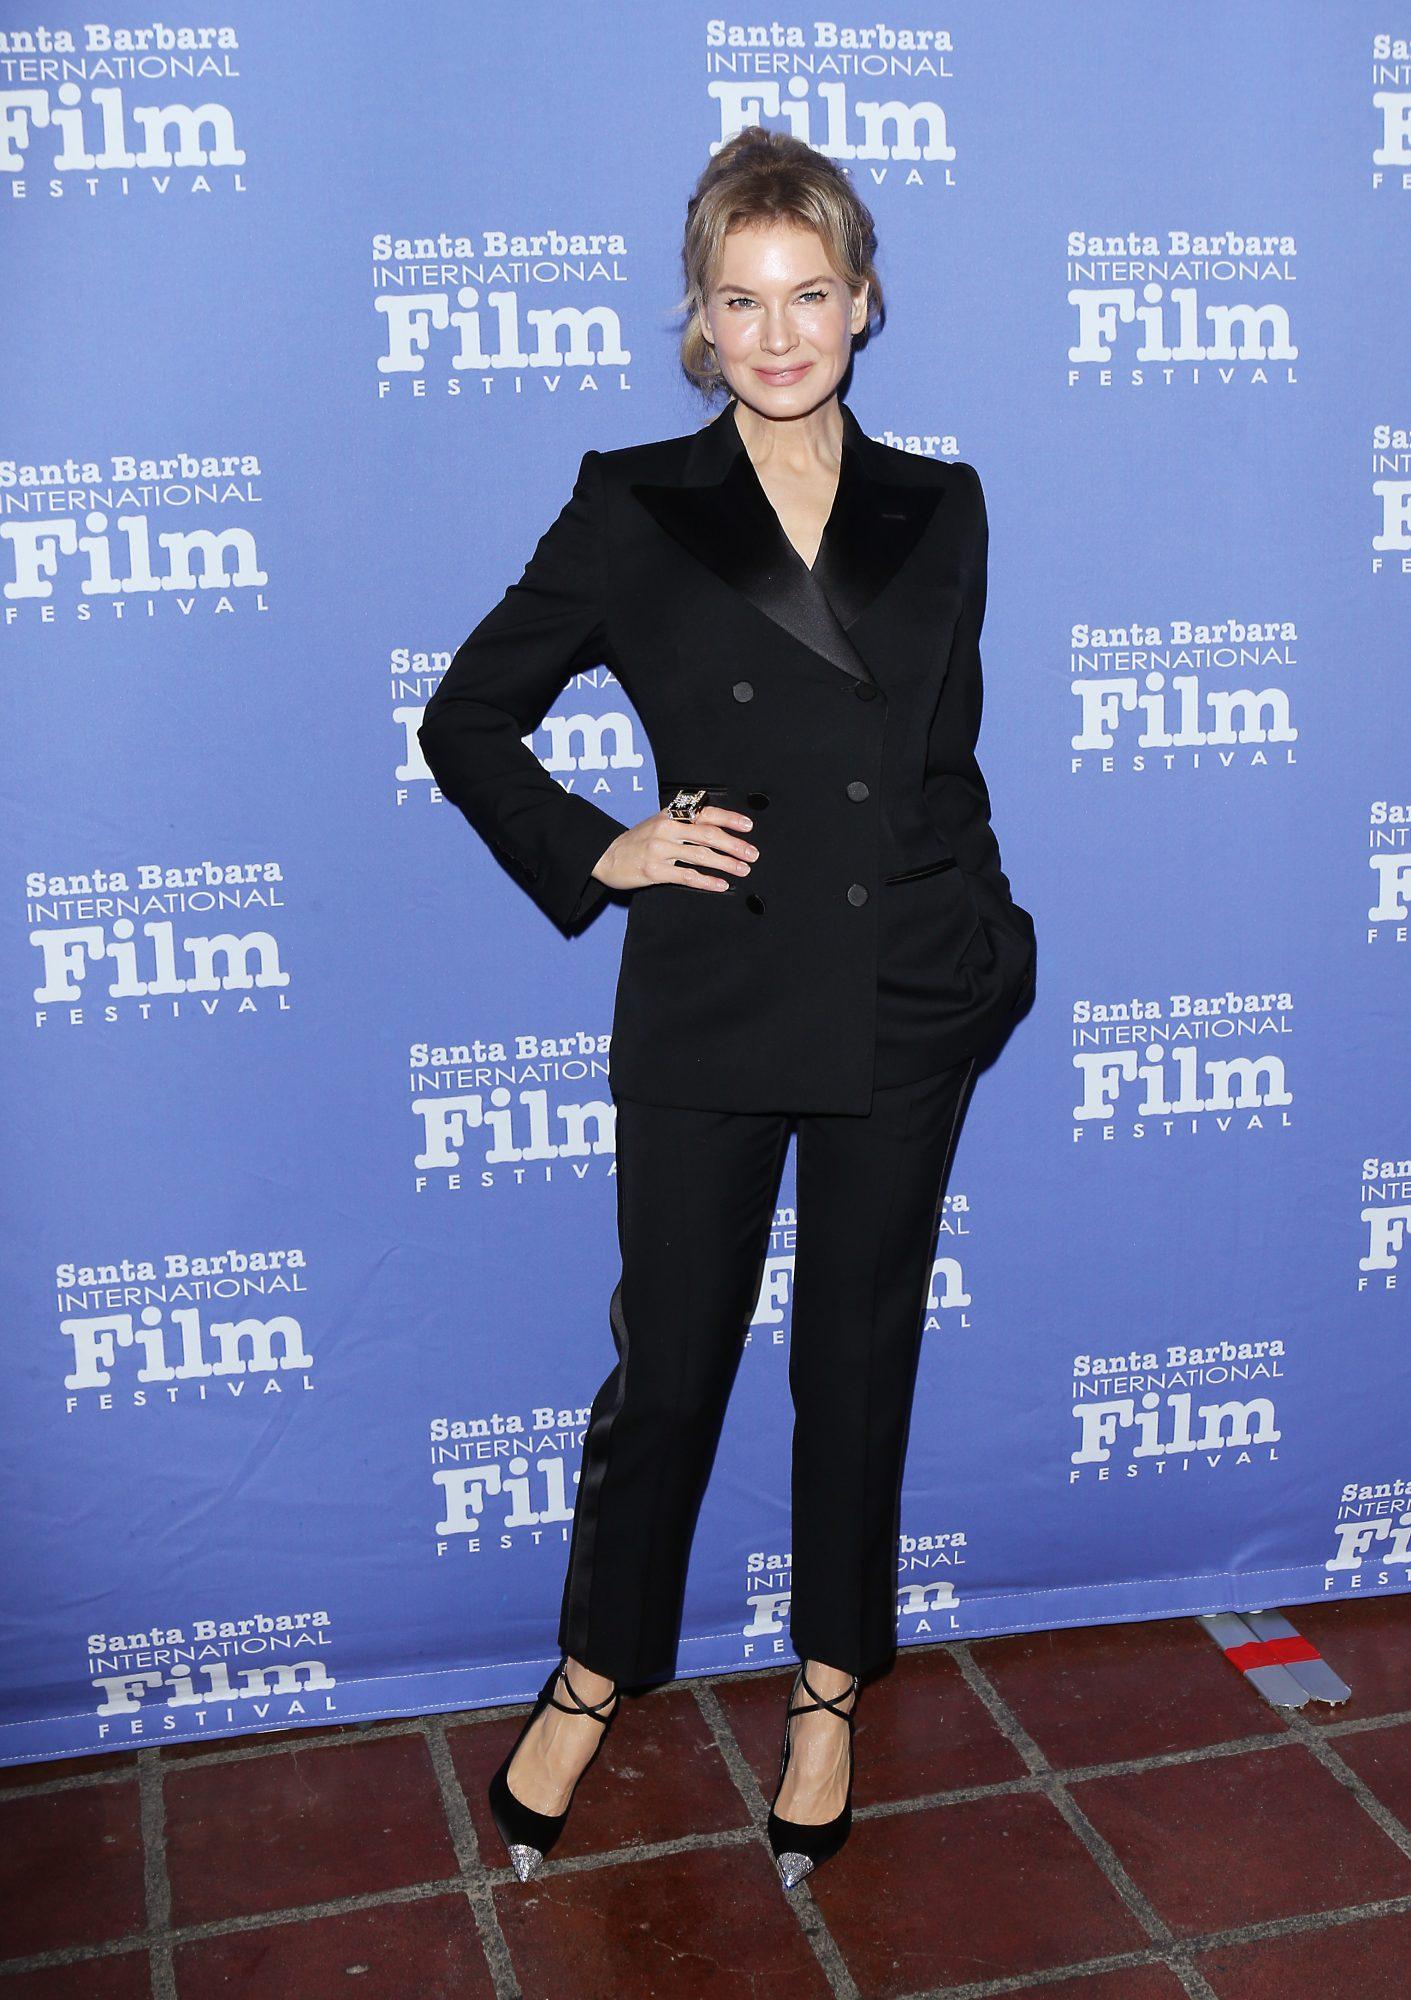 35th Annual Santa Barbara International Film Festival - American Riviera Award